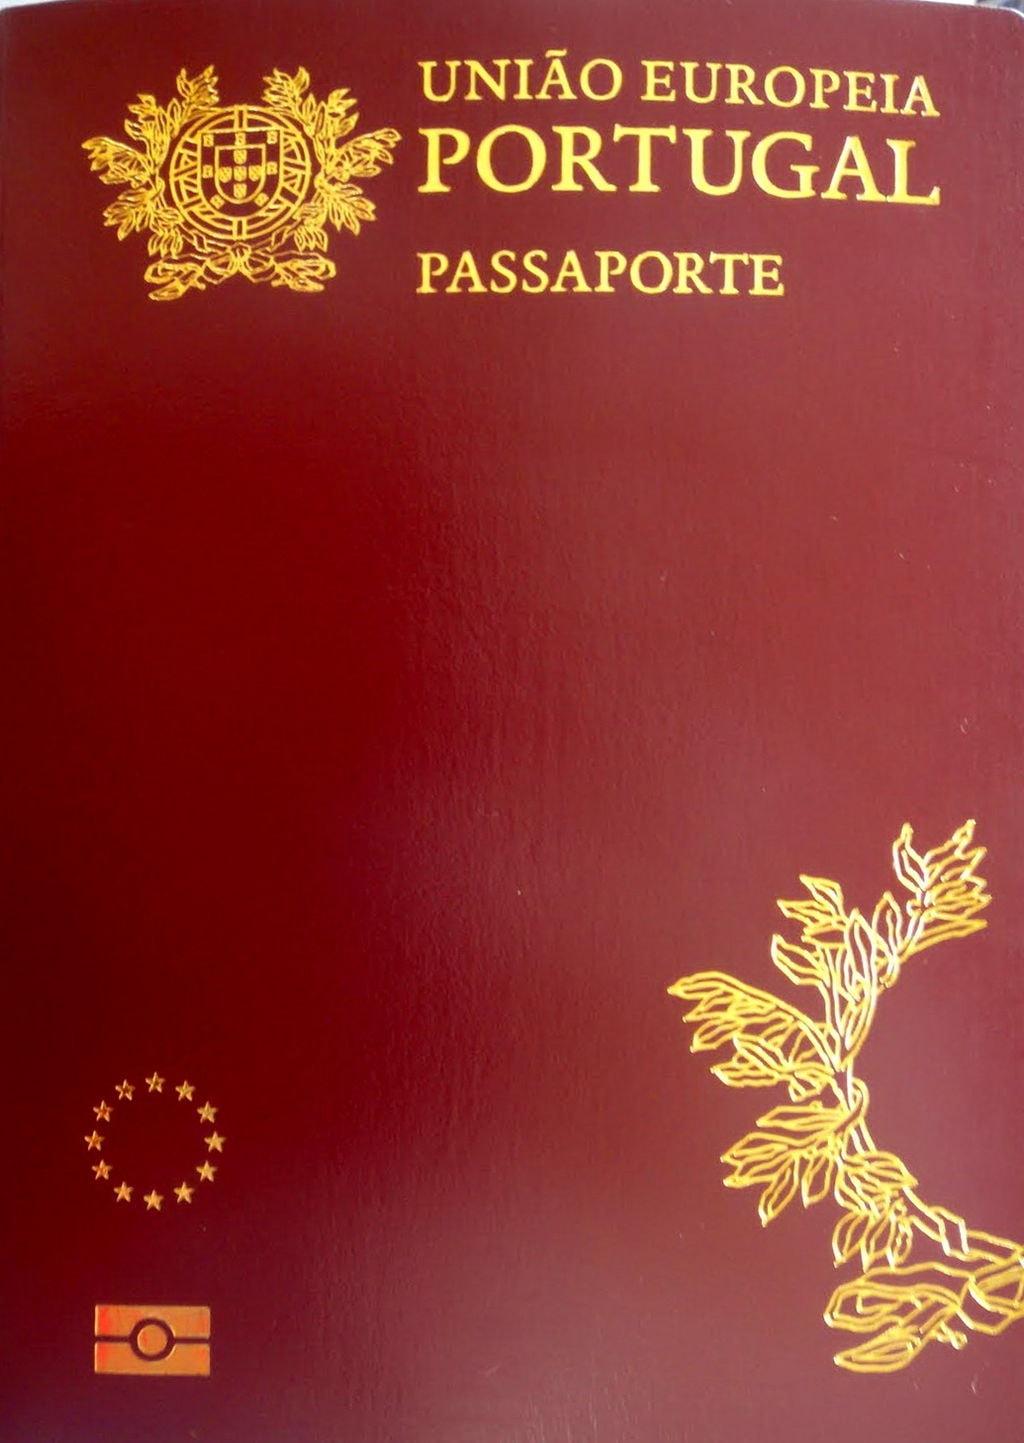 https://commons.wikimedia.org/wiki/File:Portuguese_passport.JPG